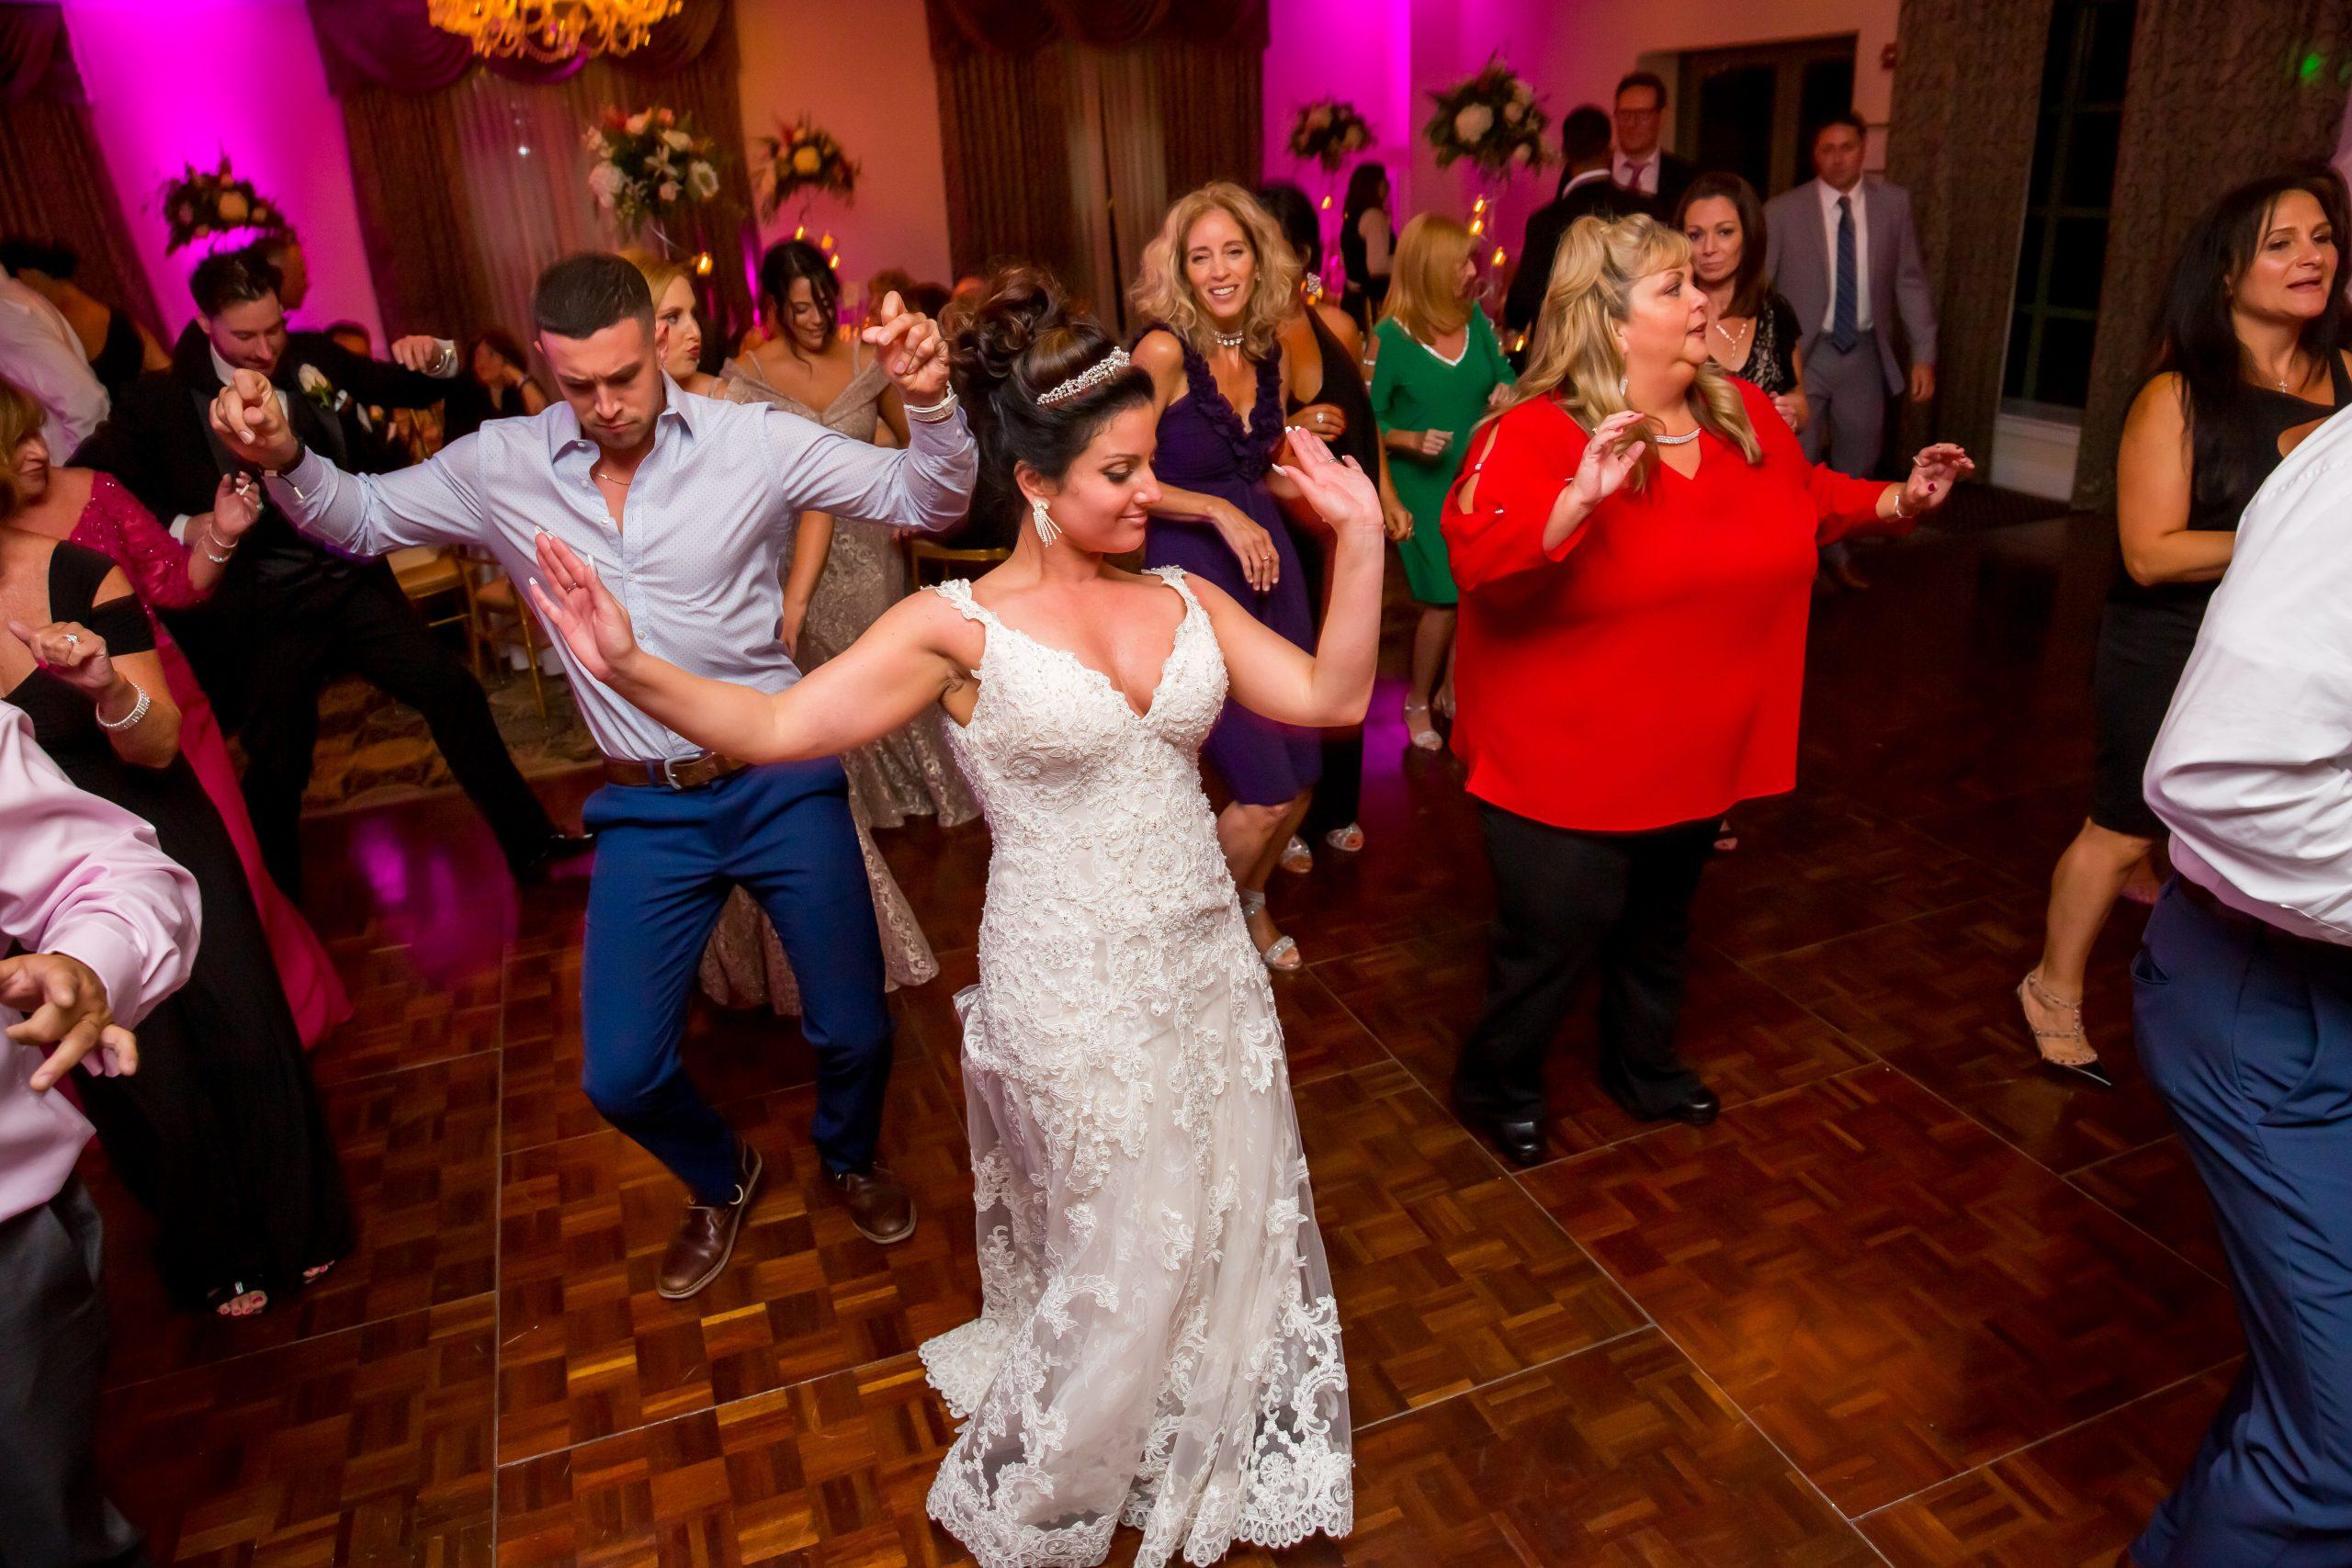 Victori_Rob_Mohawk River Country Club Wedding-65.jpg